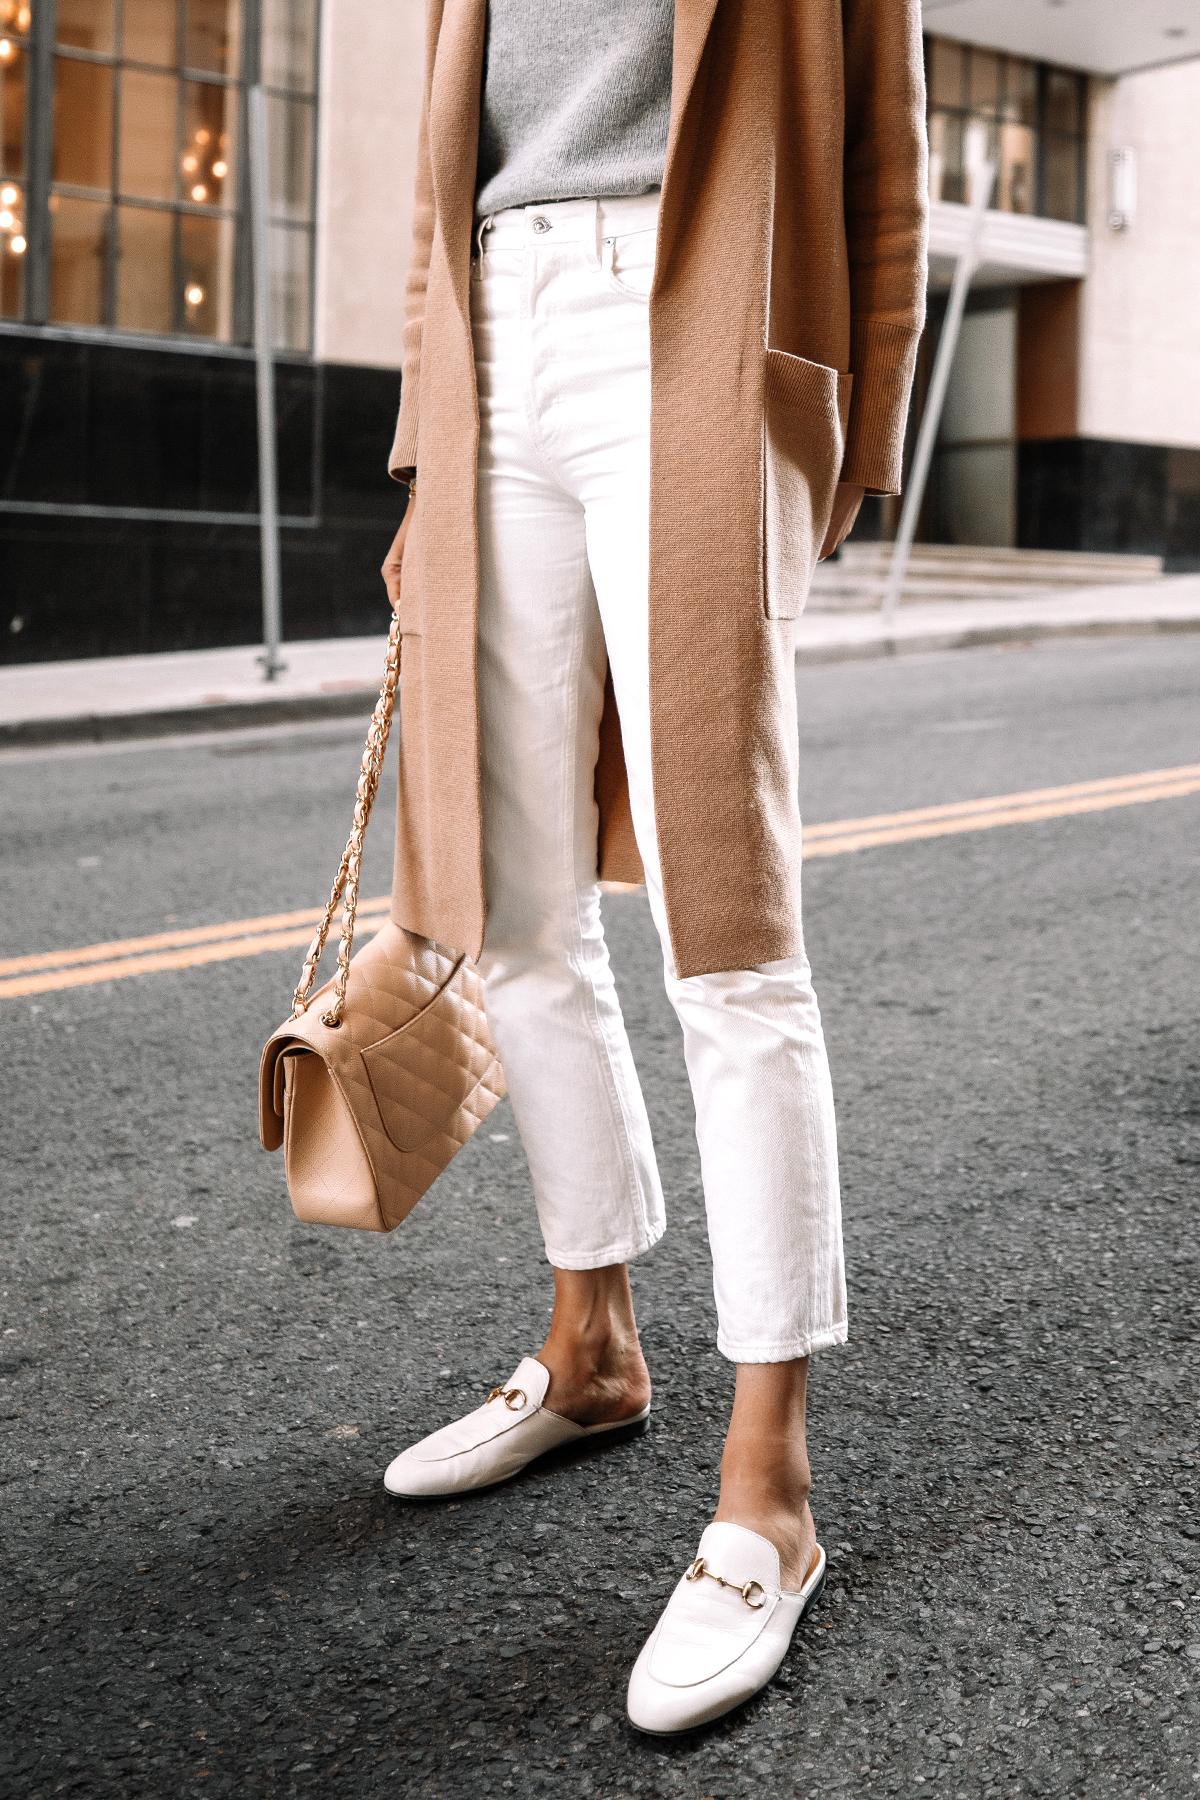 Fashion Jackson Wearing Tan Cardigan Grey Sweater White Jeans White Gucci Princetown Mules